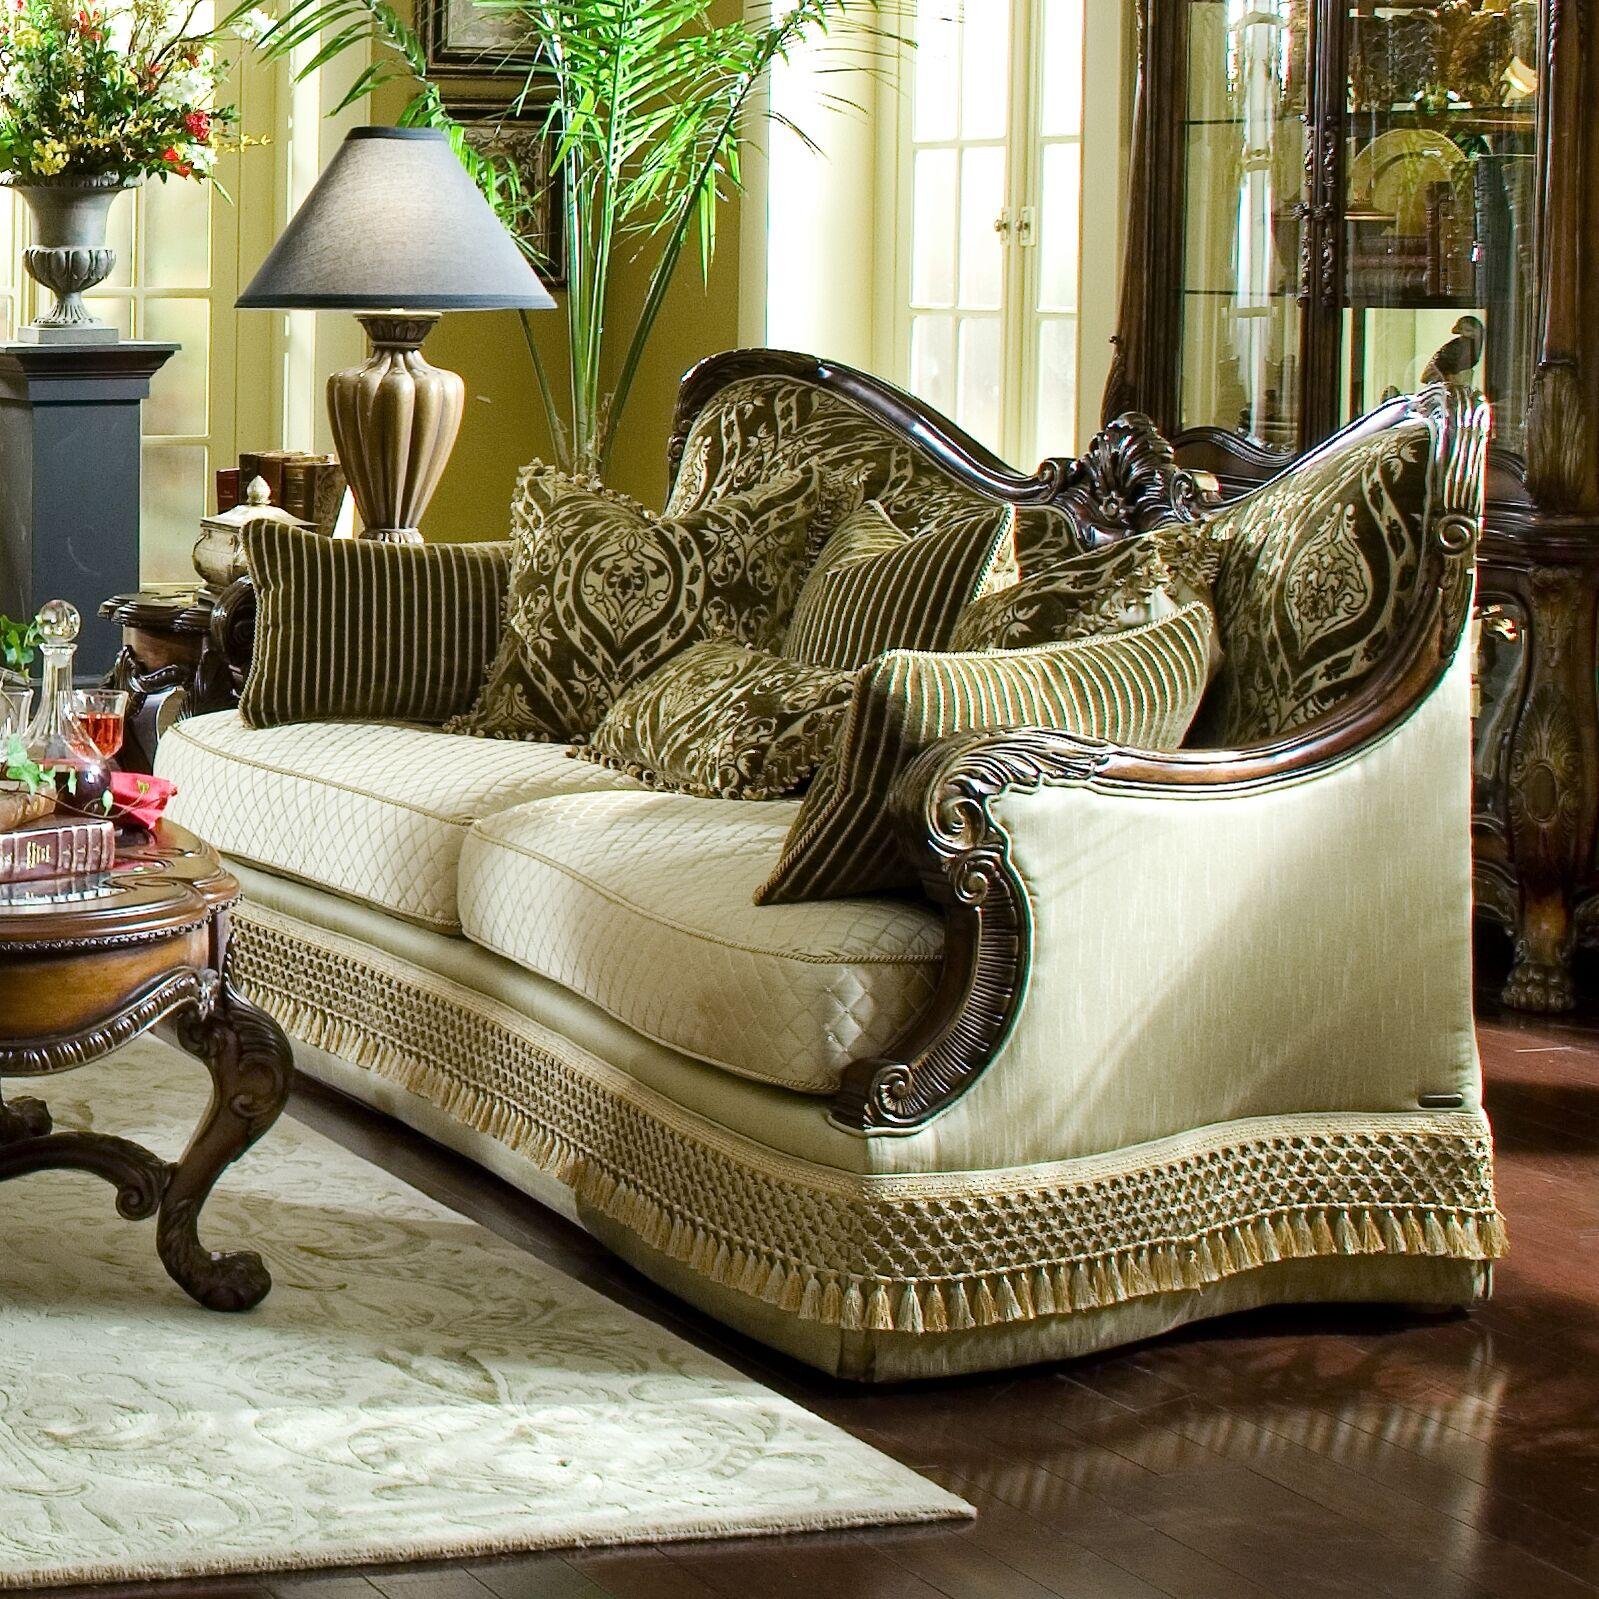 Chateau Beauvais Sofa Upholstery: Gold